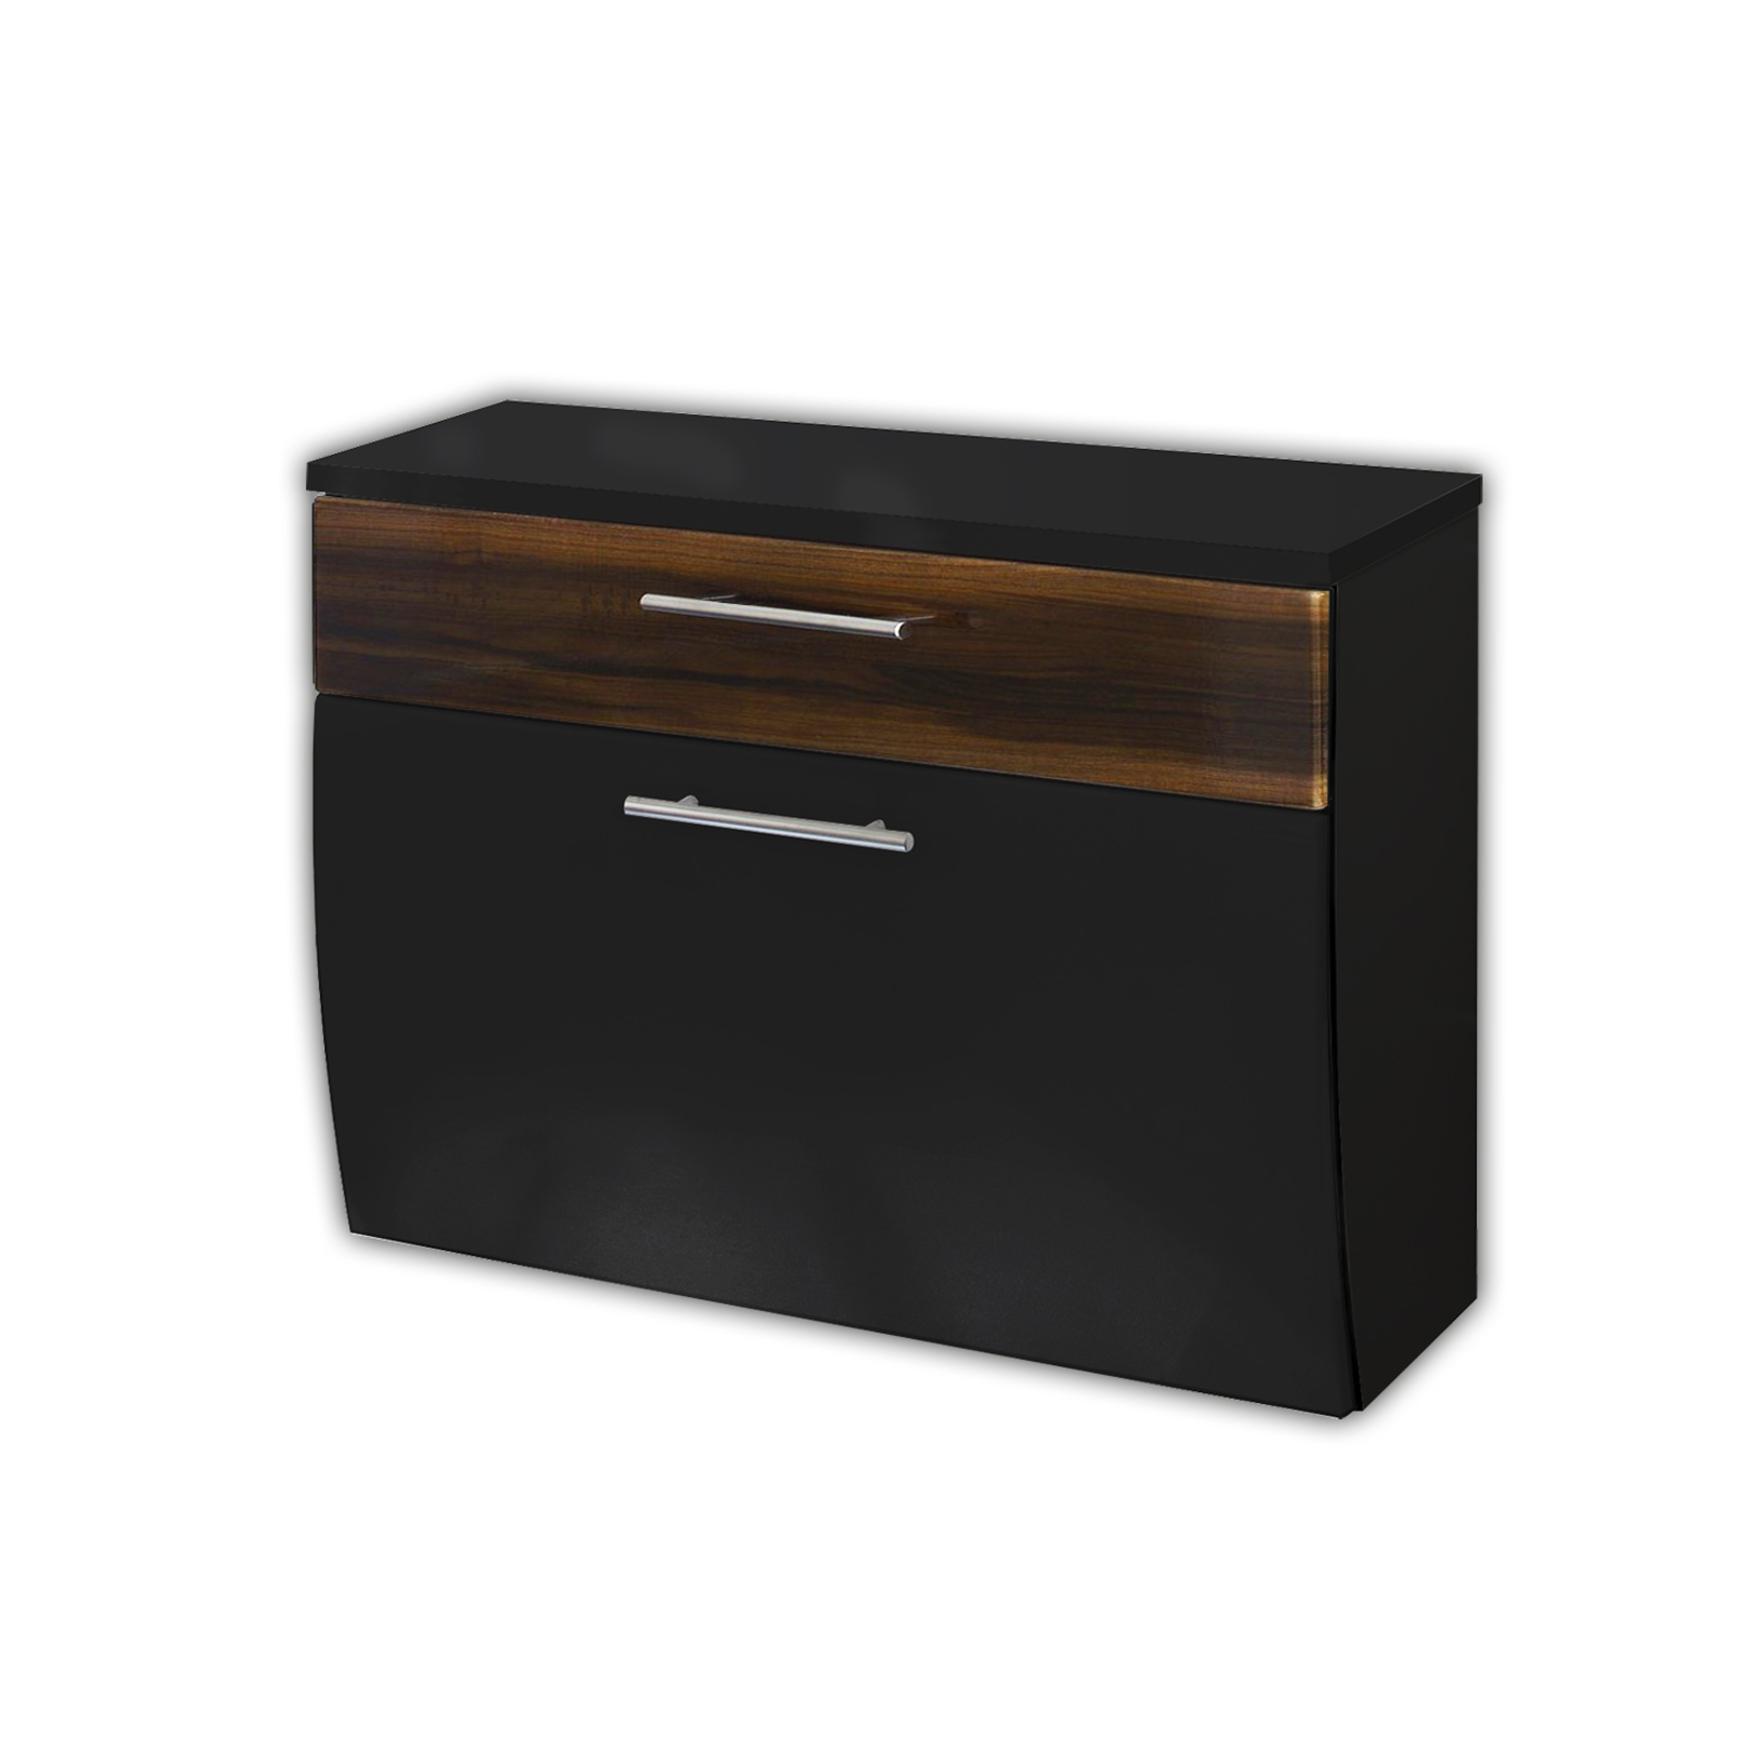 70 cm breit gallery of prato mirror cabinet cm breit with. Black Bedroom Furniture Sets. Home Design Ideas